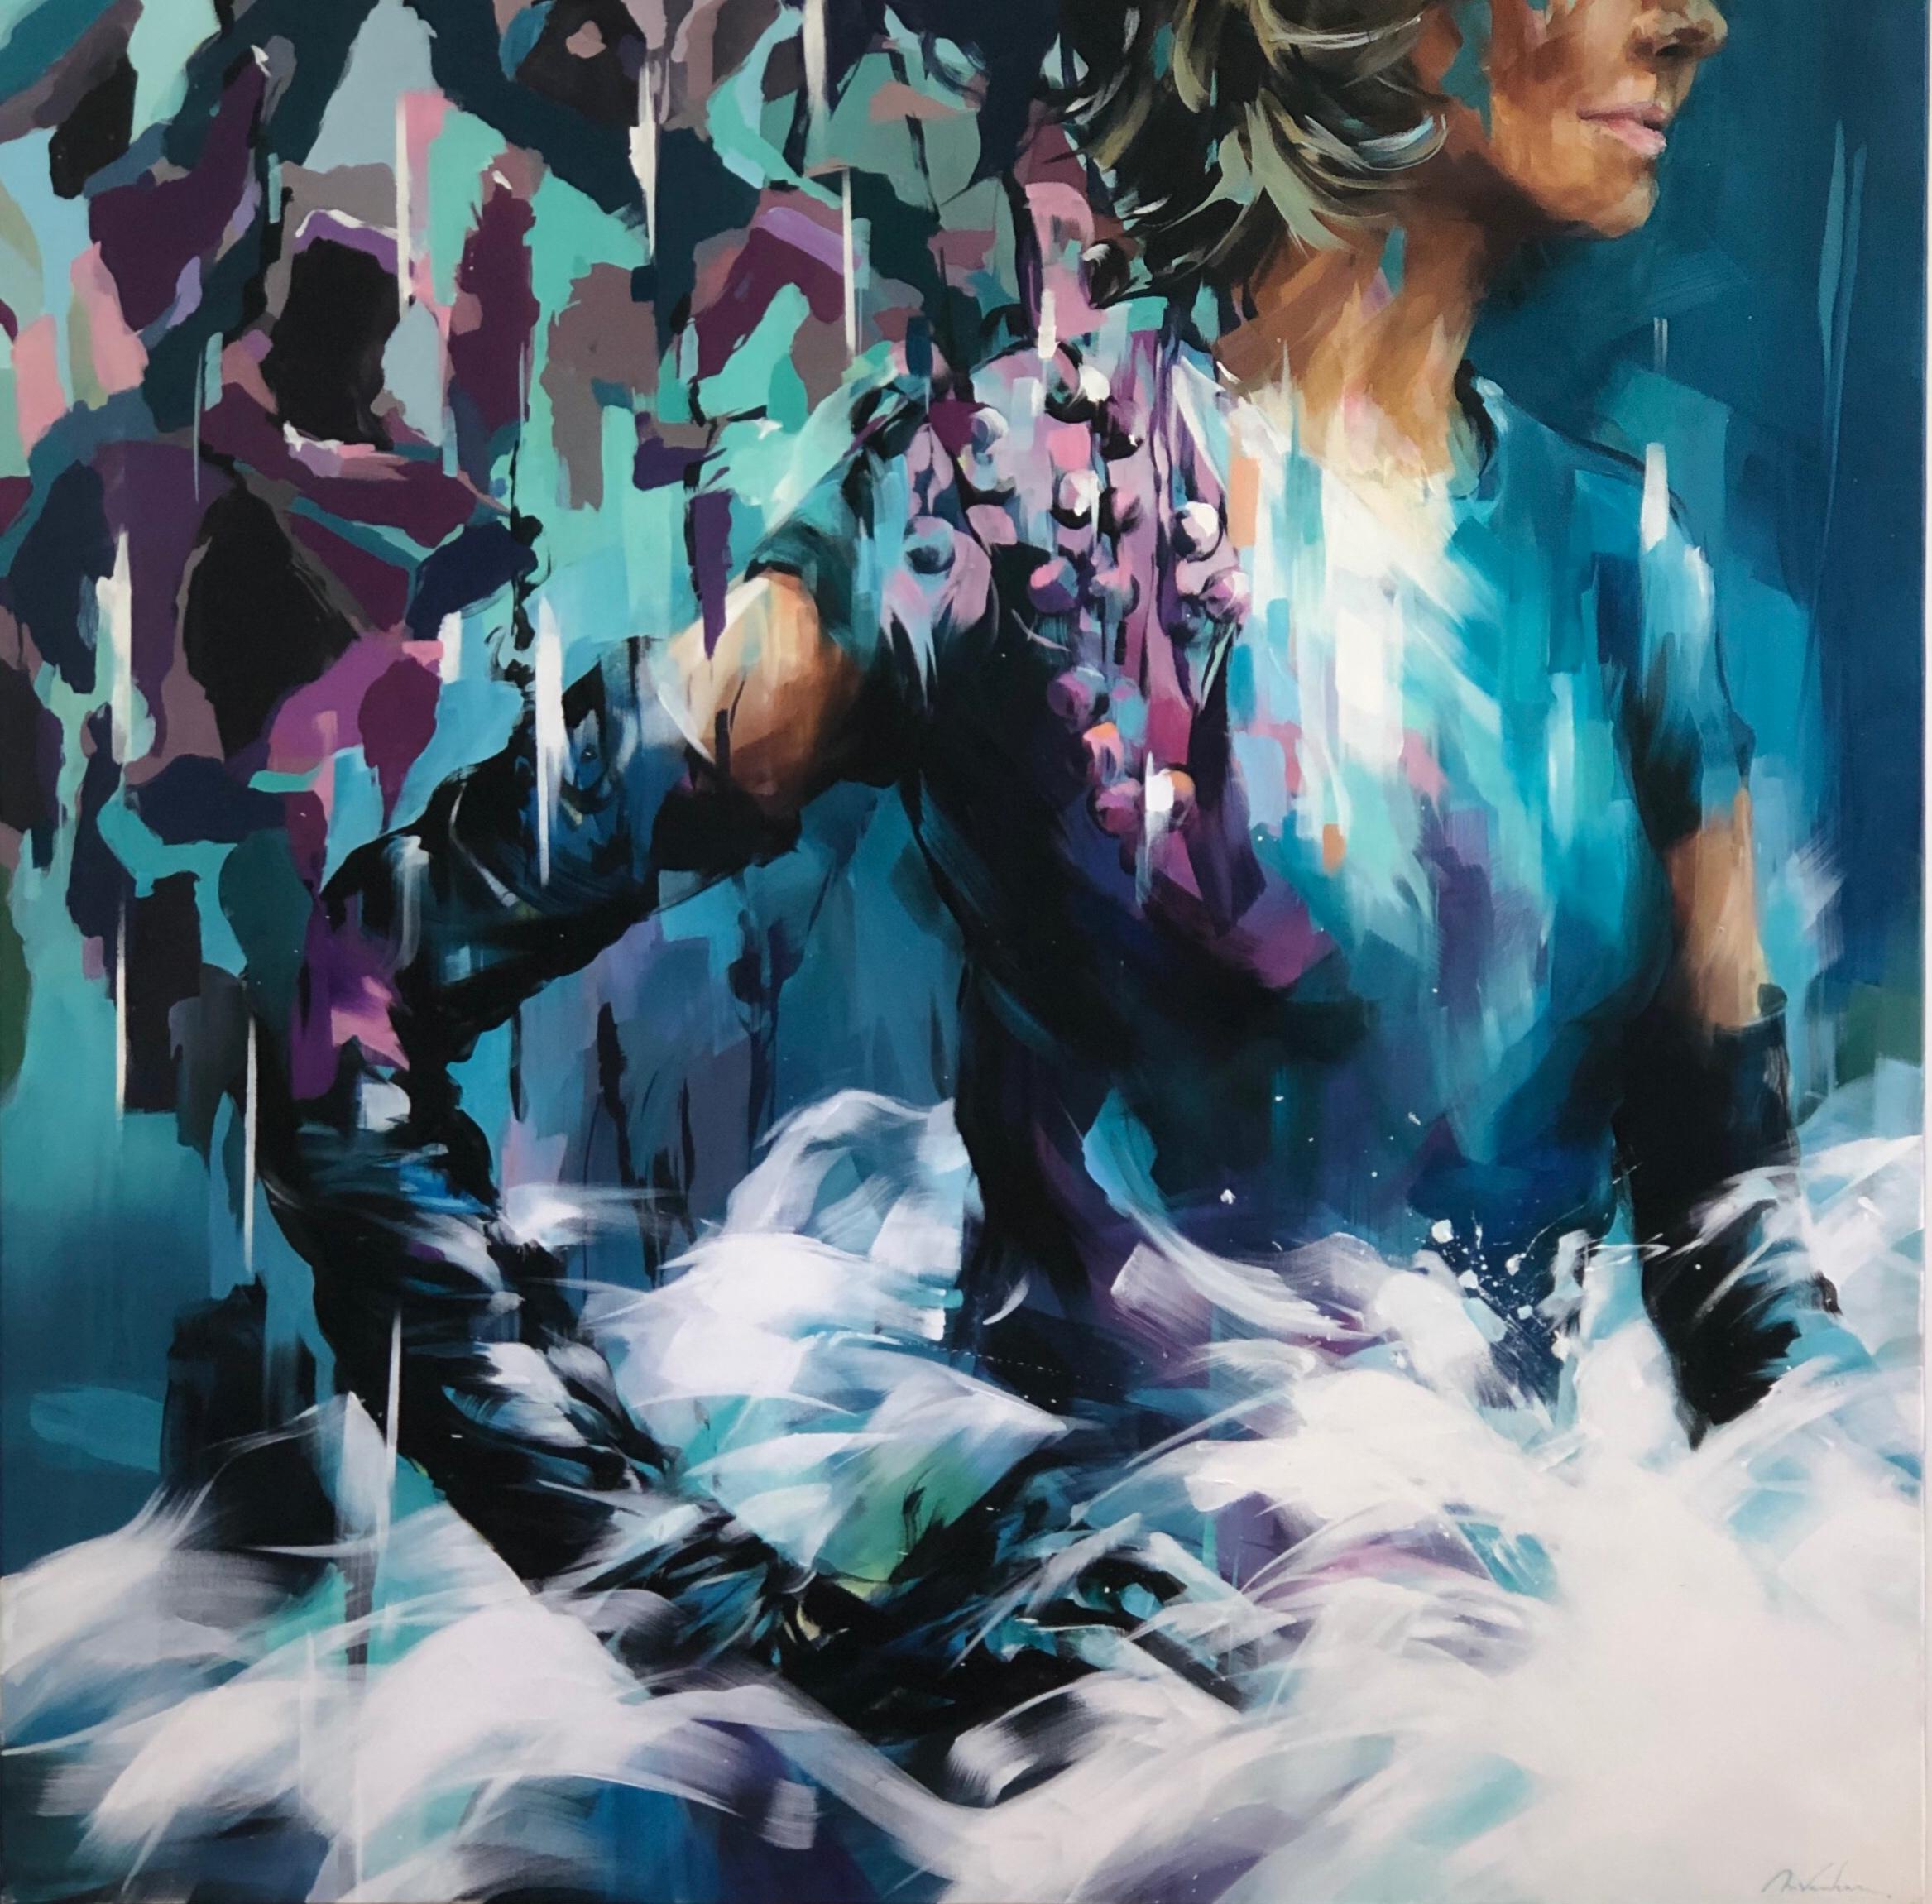 Range-of-Arts-Painting-Murielle-Vanhove-Elles-Turquoise-100x100cm